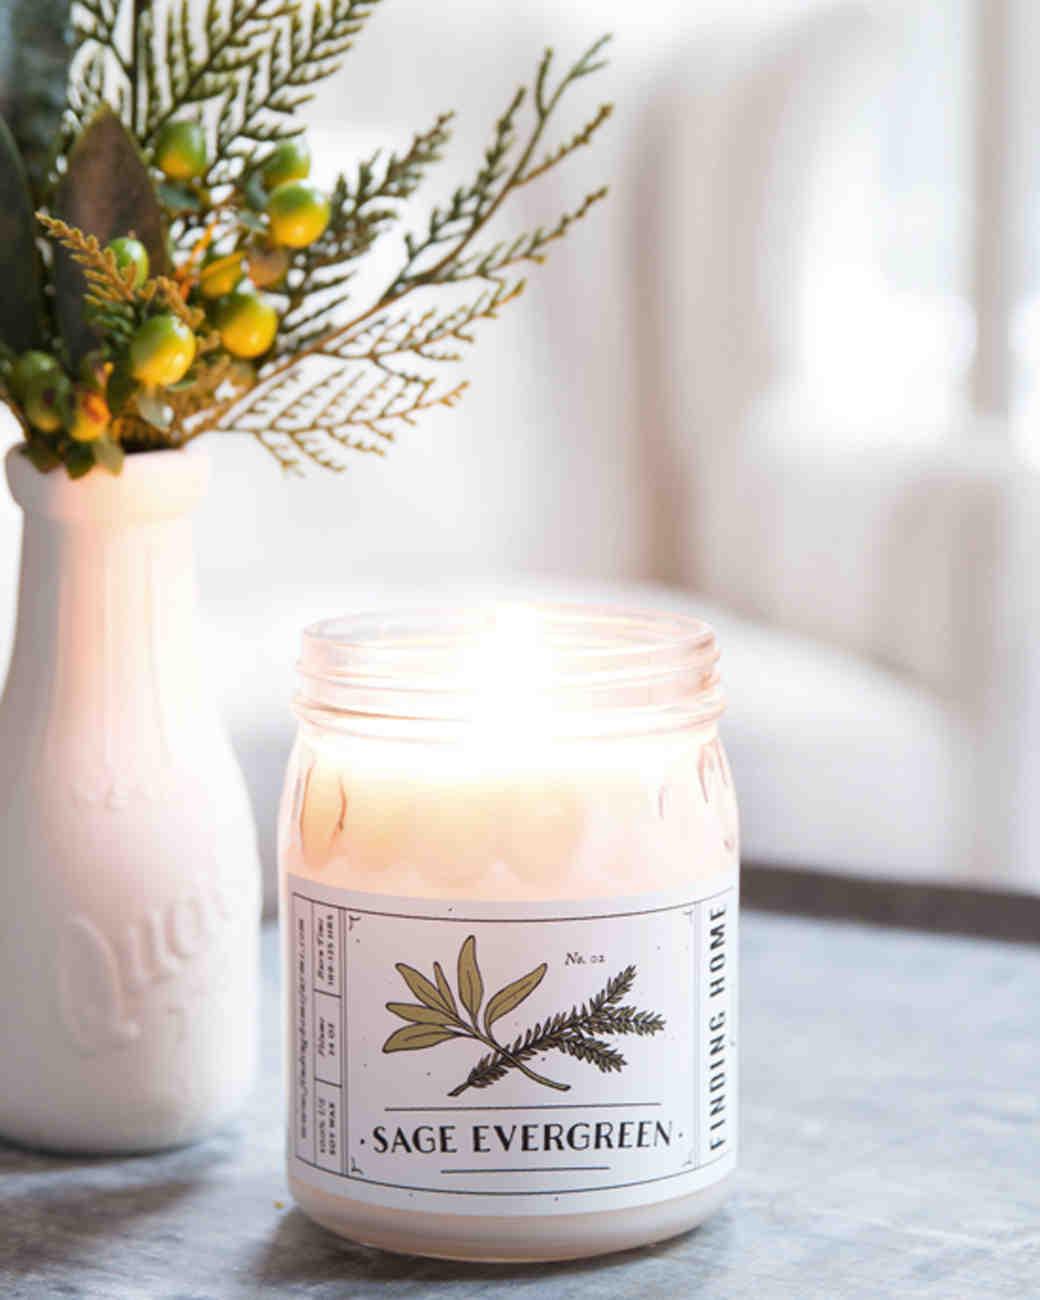 sage-evergreen-beauty-0216.jpg